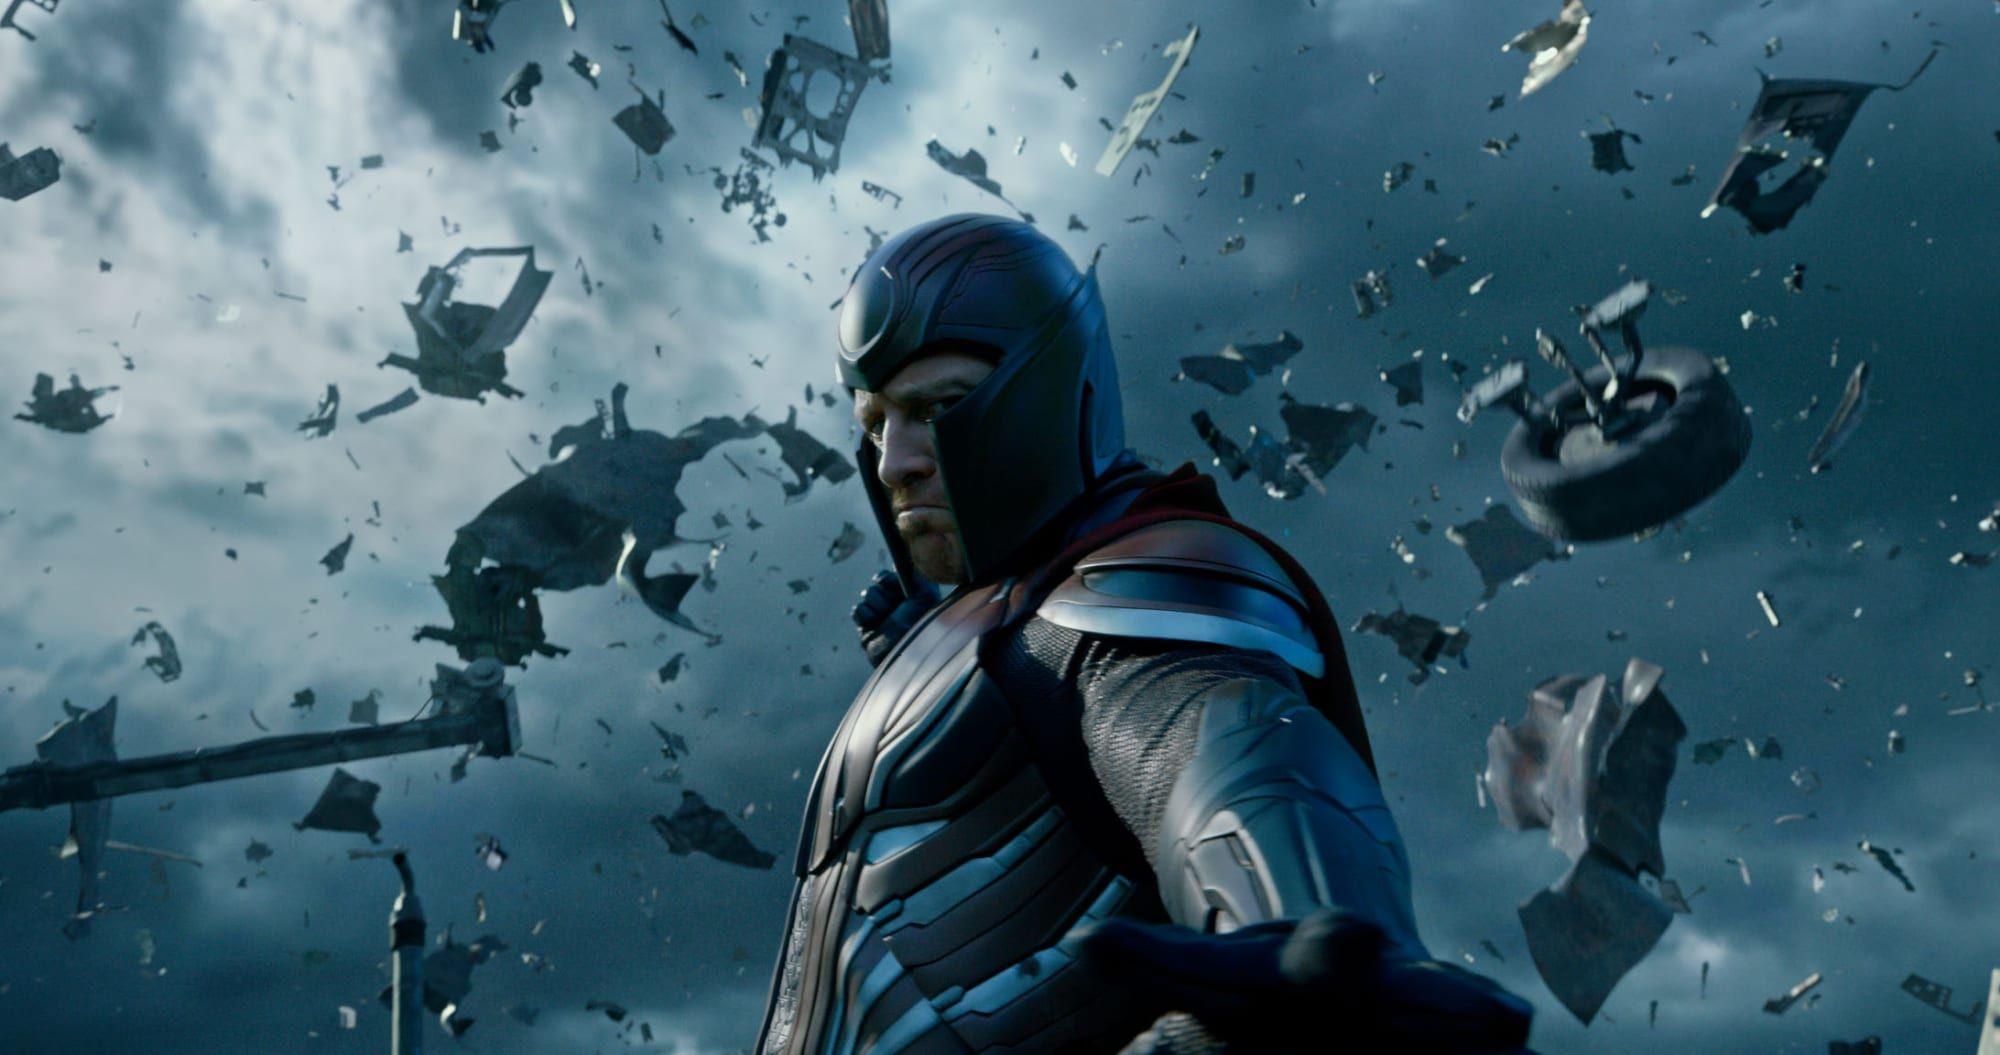 Fox S X Men Movies Are Coming To Disney Plus In Summer 2020 Disneyplus In 2020 Disney Plus X Men Man Movies